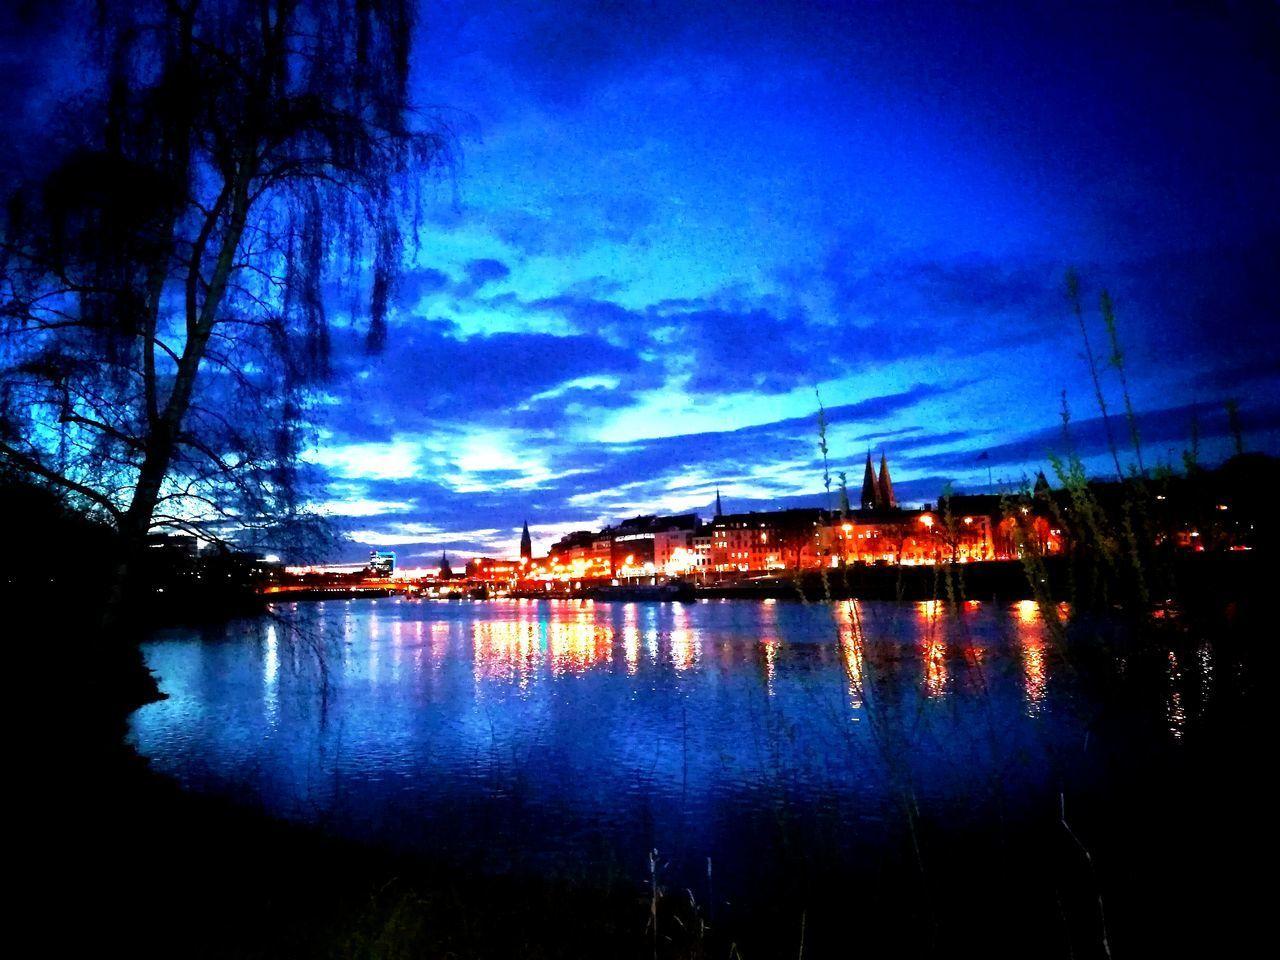 Sky Water Built Structure Outdoors Bremen Weser River Night Bremen Germany Sunset No People Cloud - Sky Silhouette Wonderful